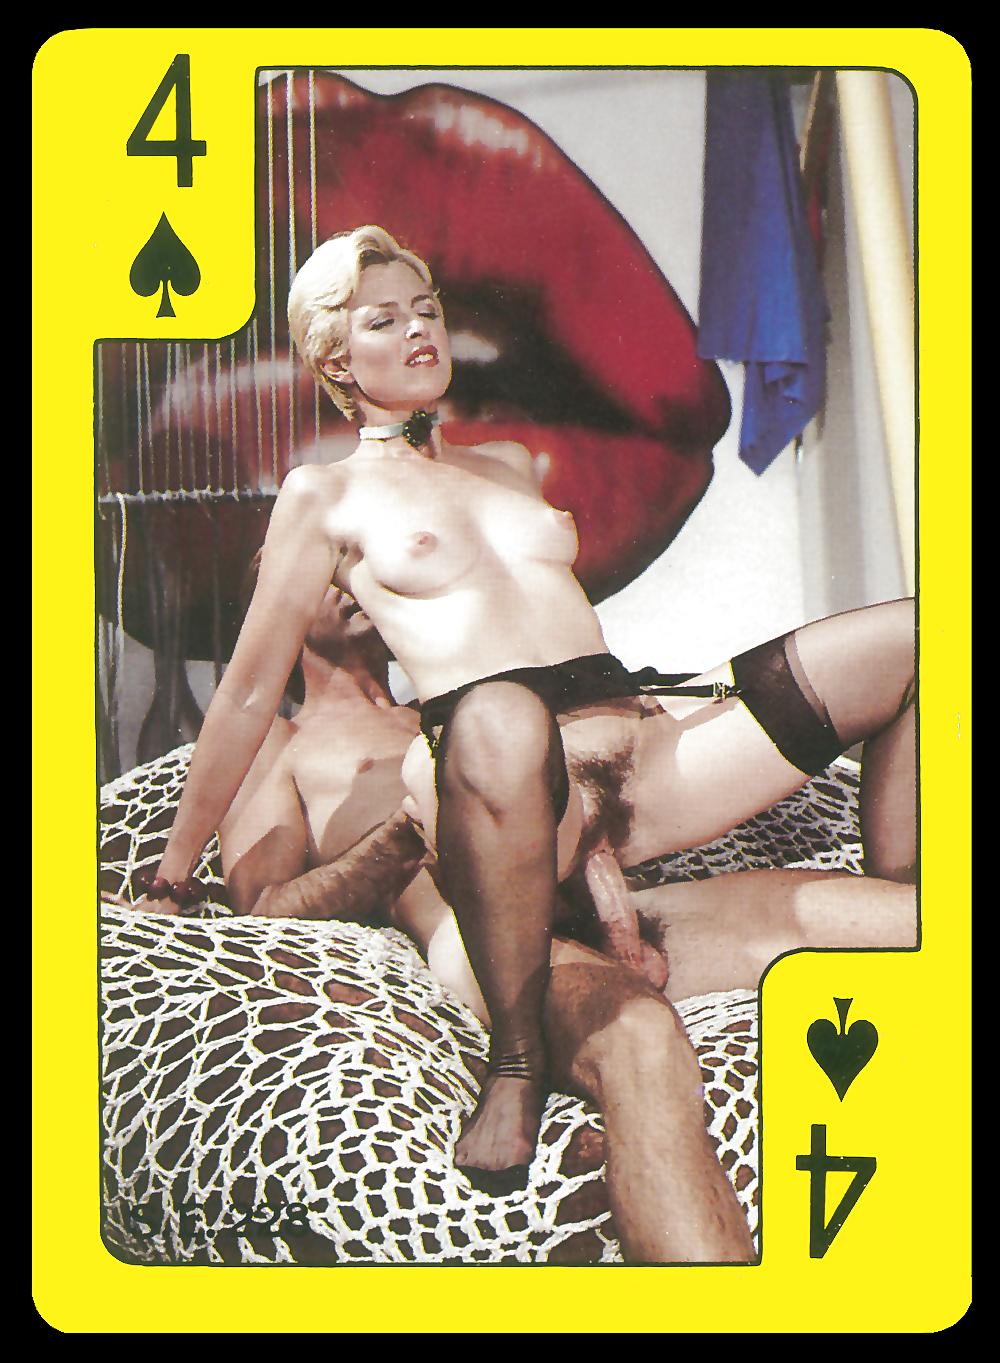 Richardson x pornhub playing cards release info